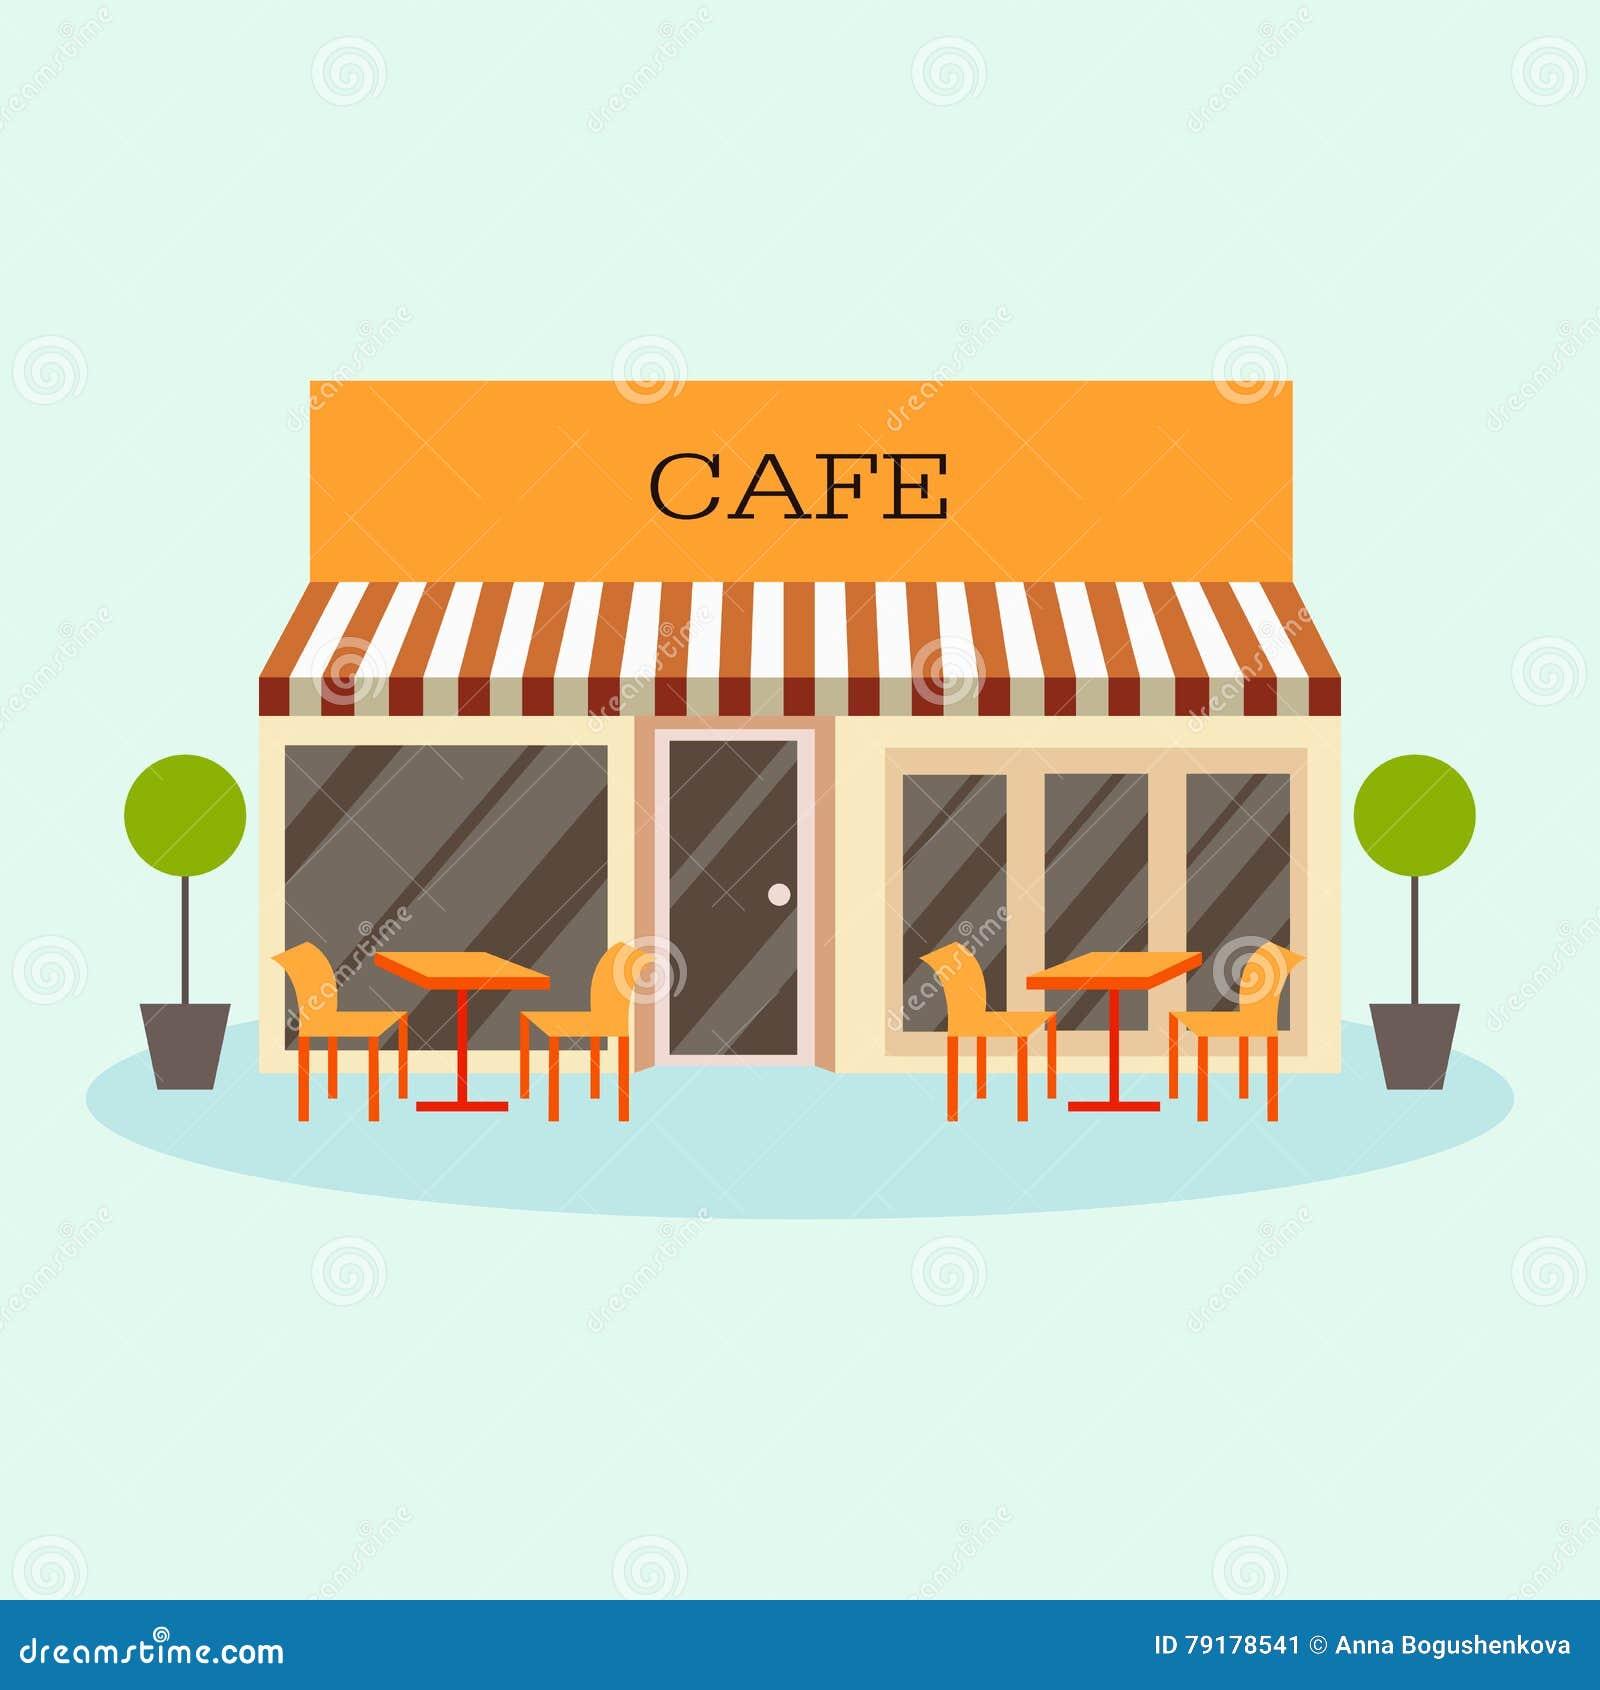 Building cartoon clipart restaurant building and restaurant building - Royalty Free Illustration Download Vector Illustration Of Building Restaurant